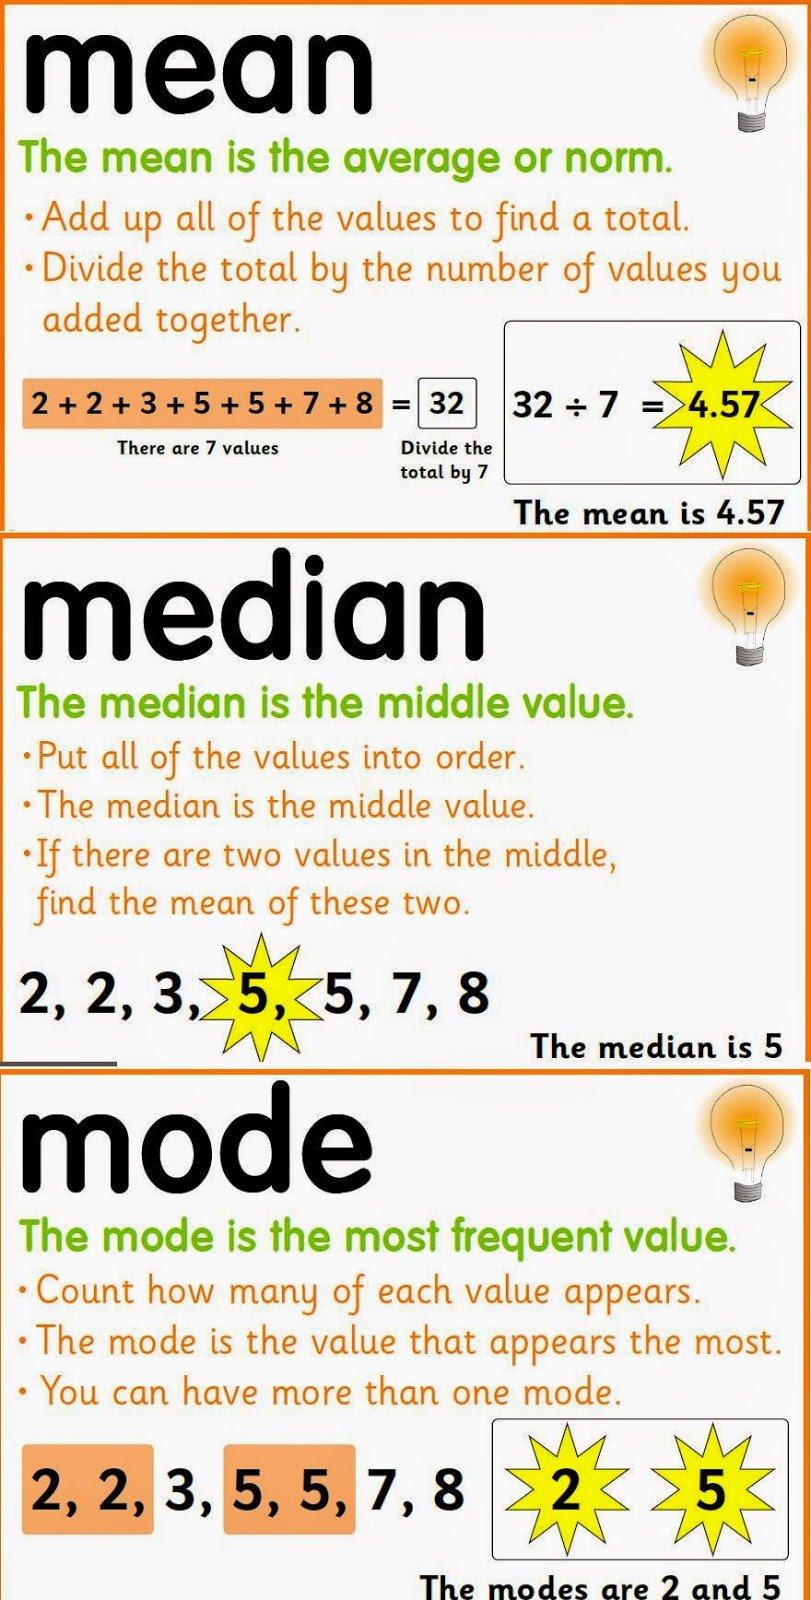 matematicas statistics grade 3 mean median mode and